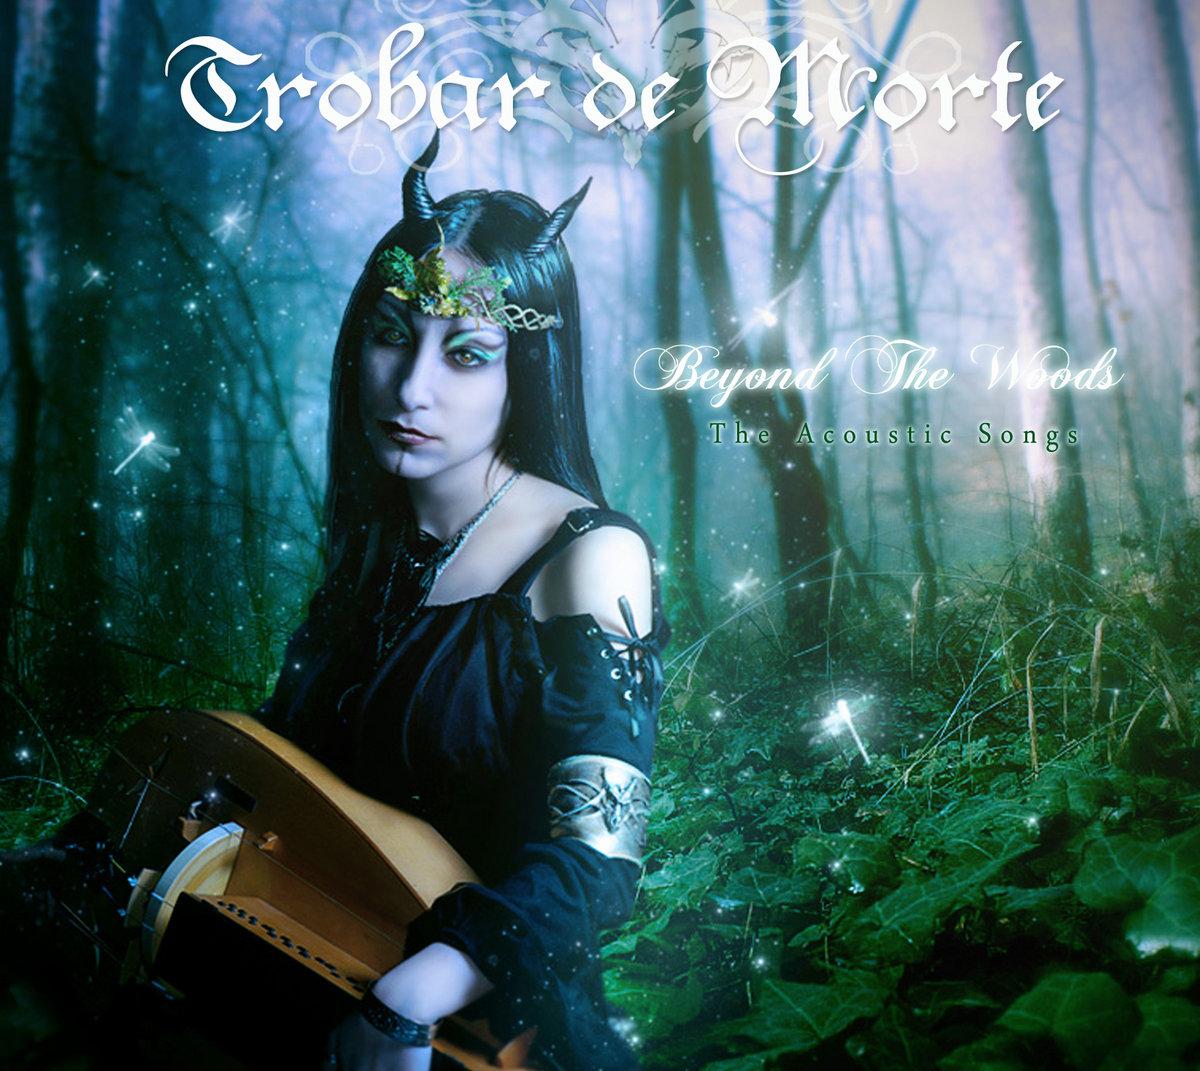 Beyond The Woods - The acoustic songs | Trobar de Morte